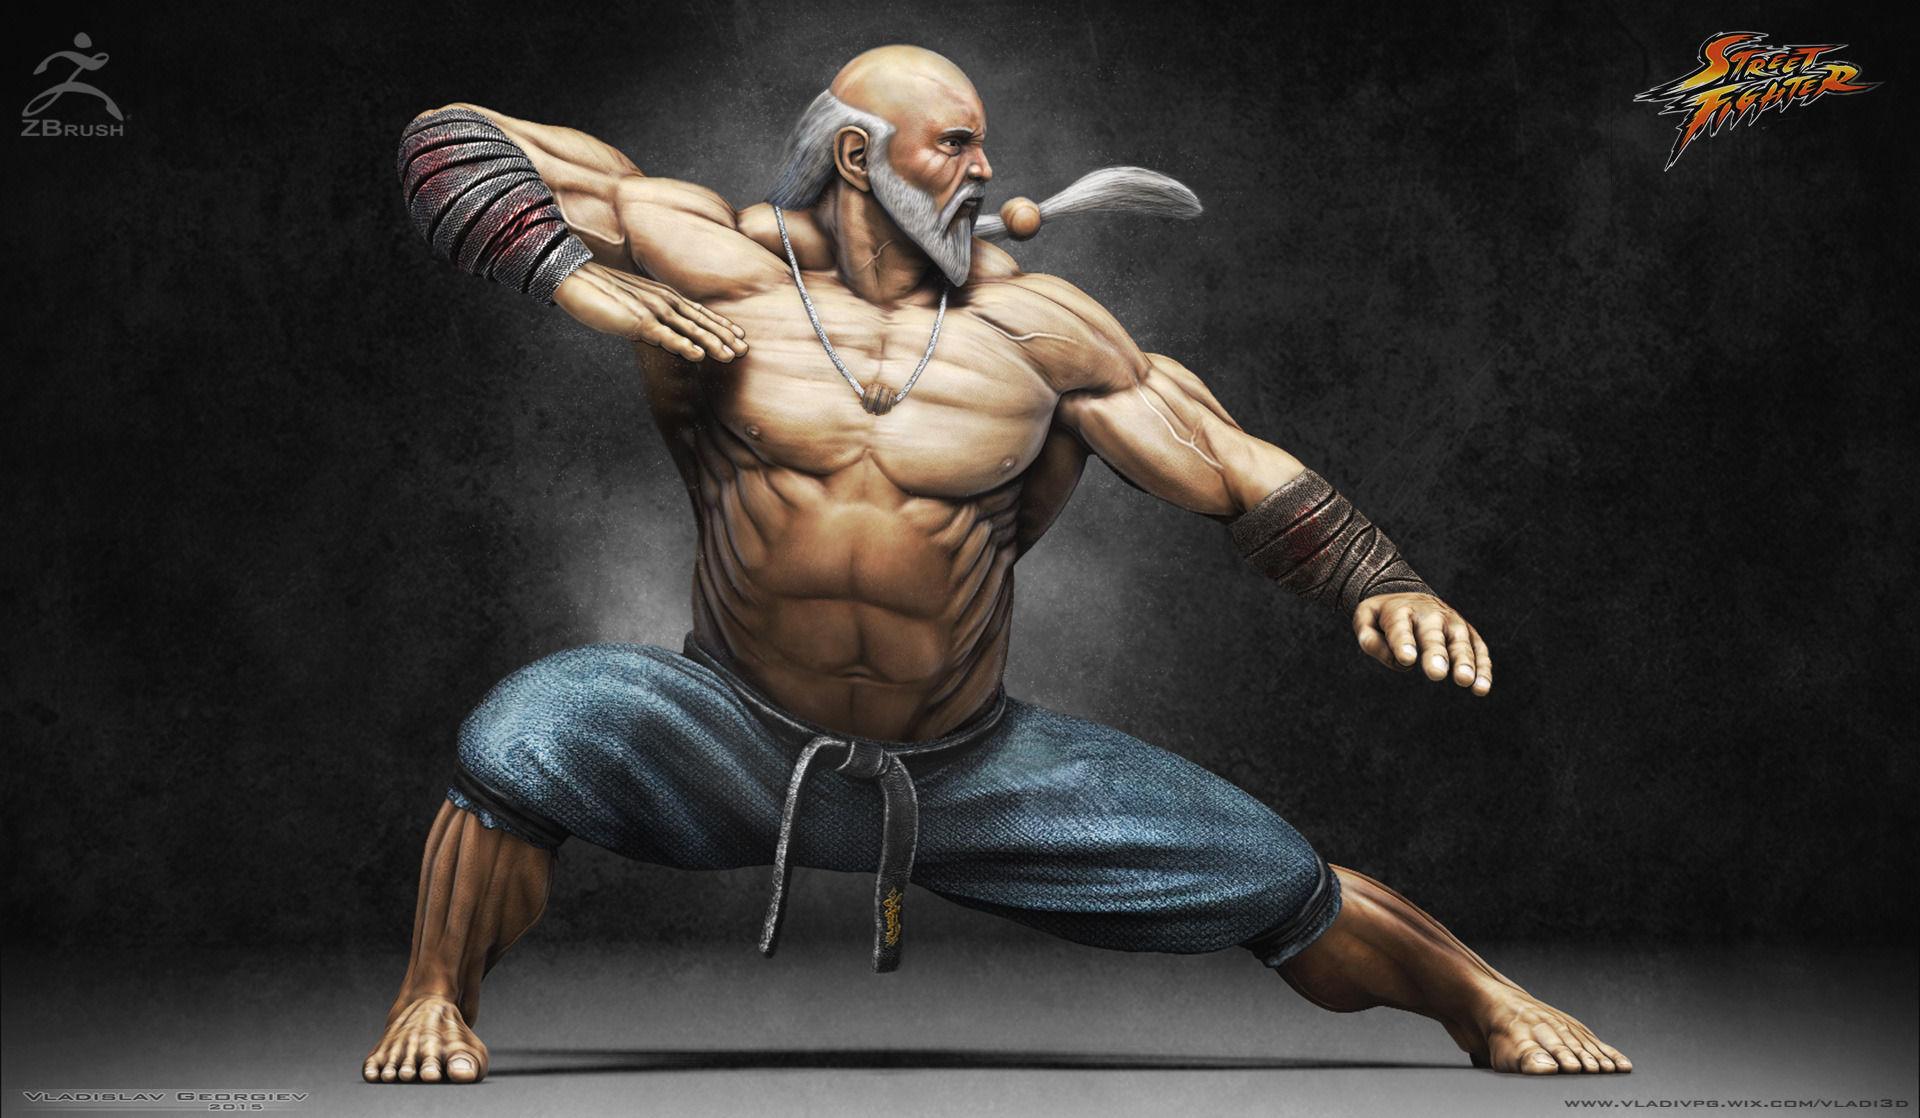 3d Model Gouken Character From The Game Street Fighter